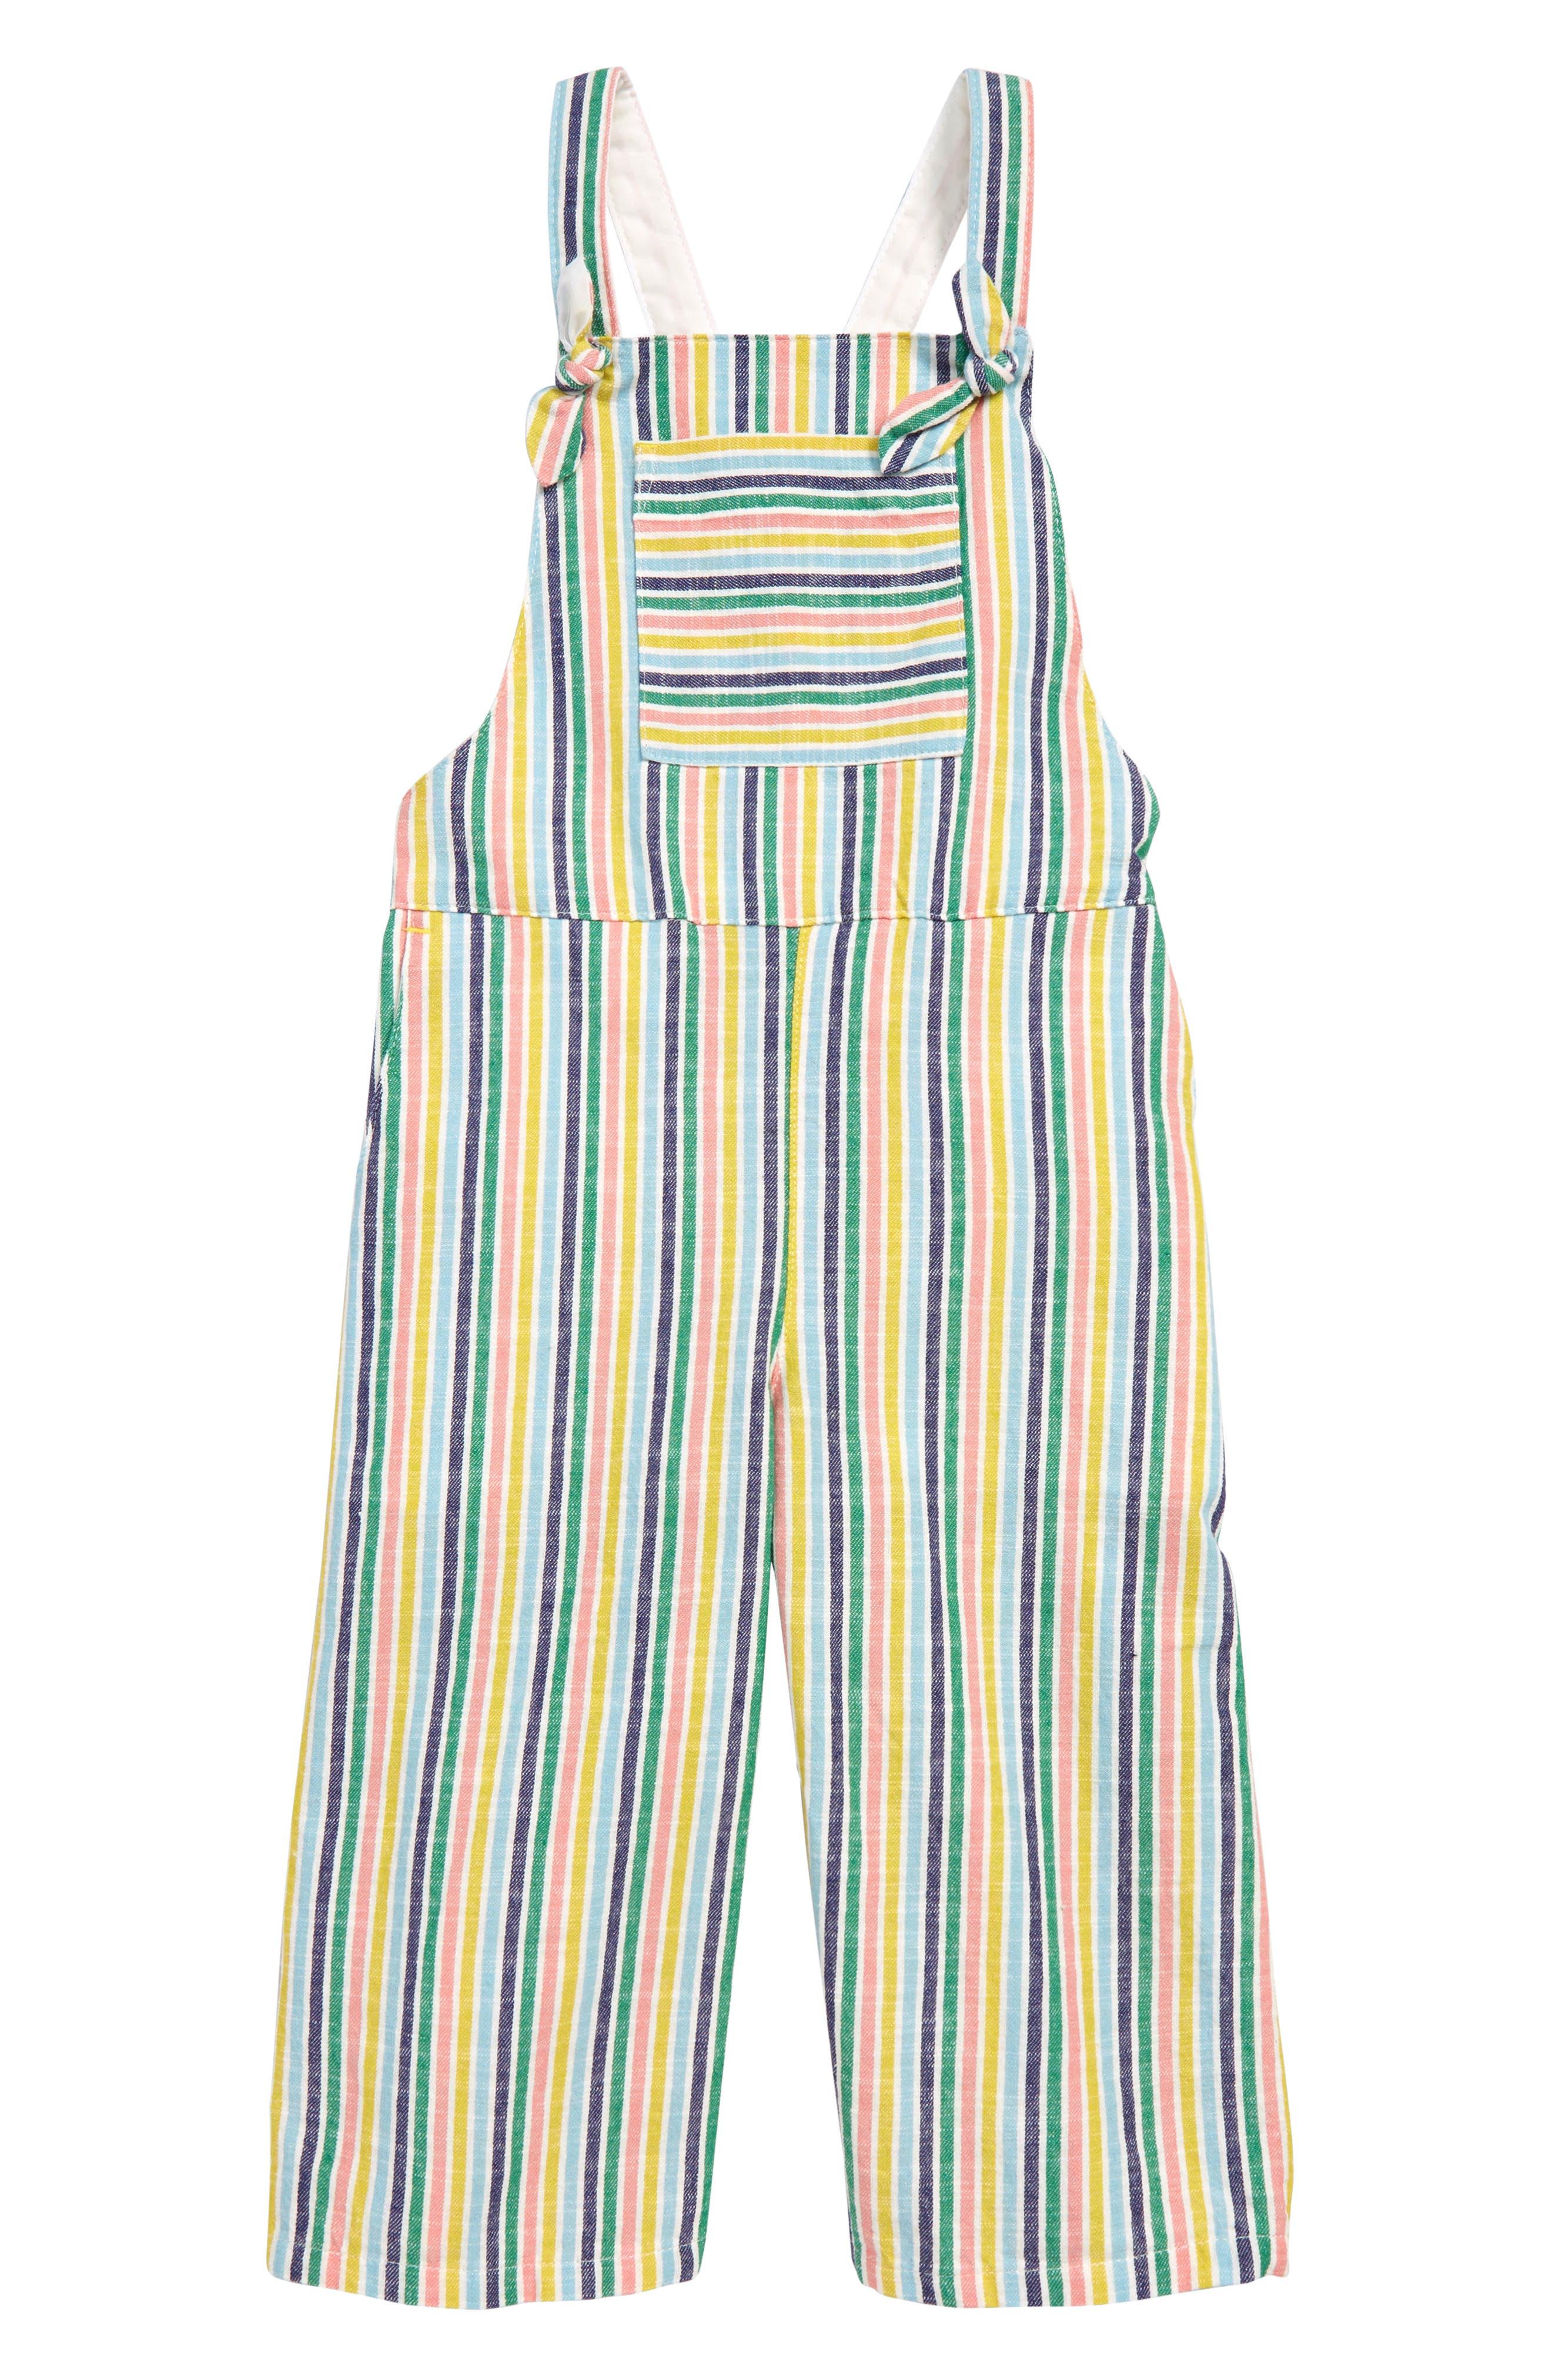 Toddler Girls Mini Boden Stripe Overalls Size 23Y  White